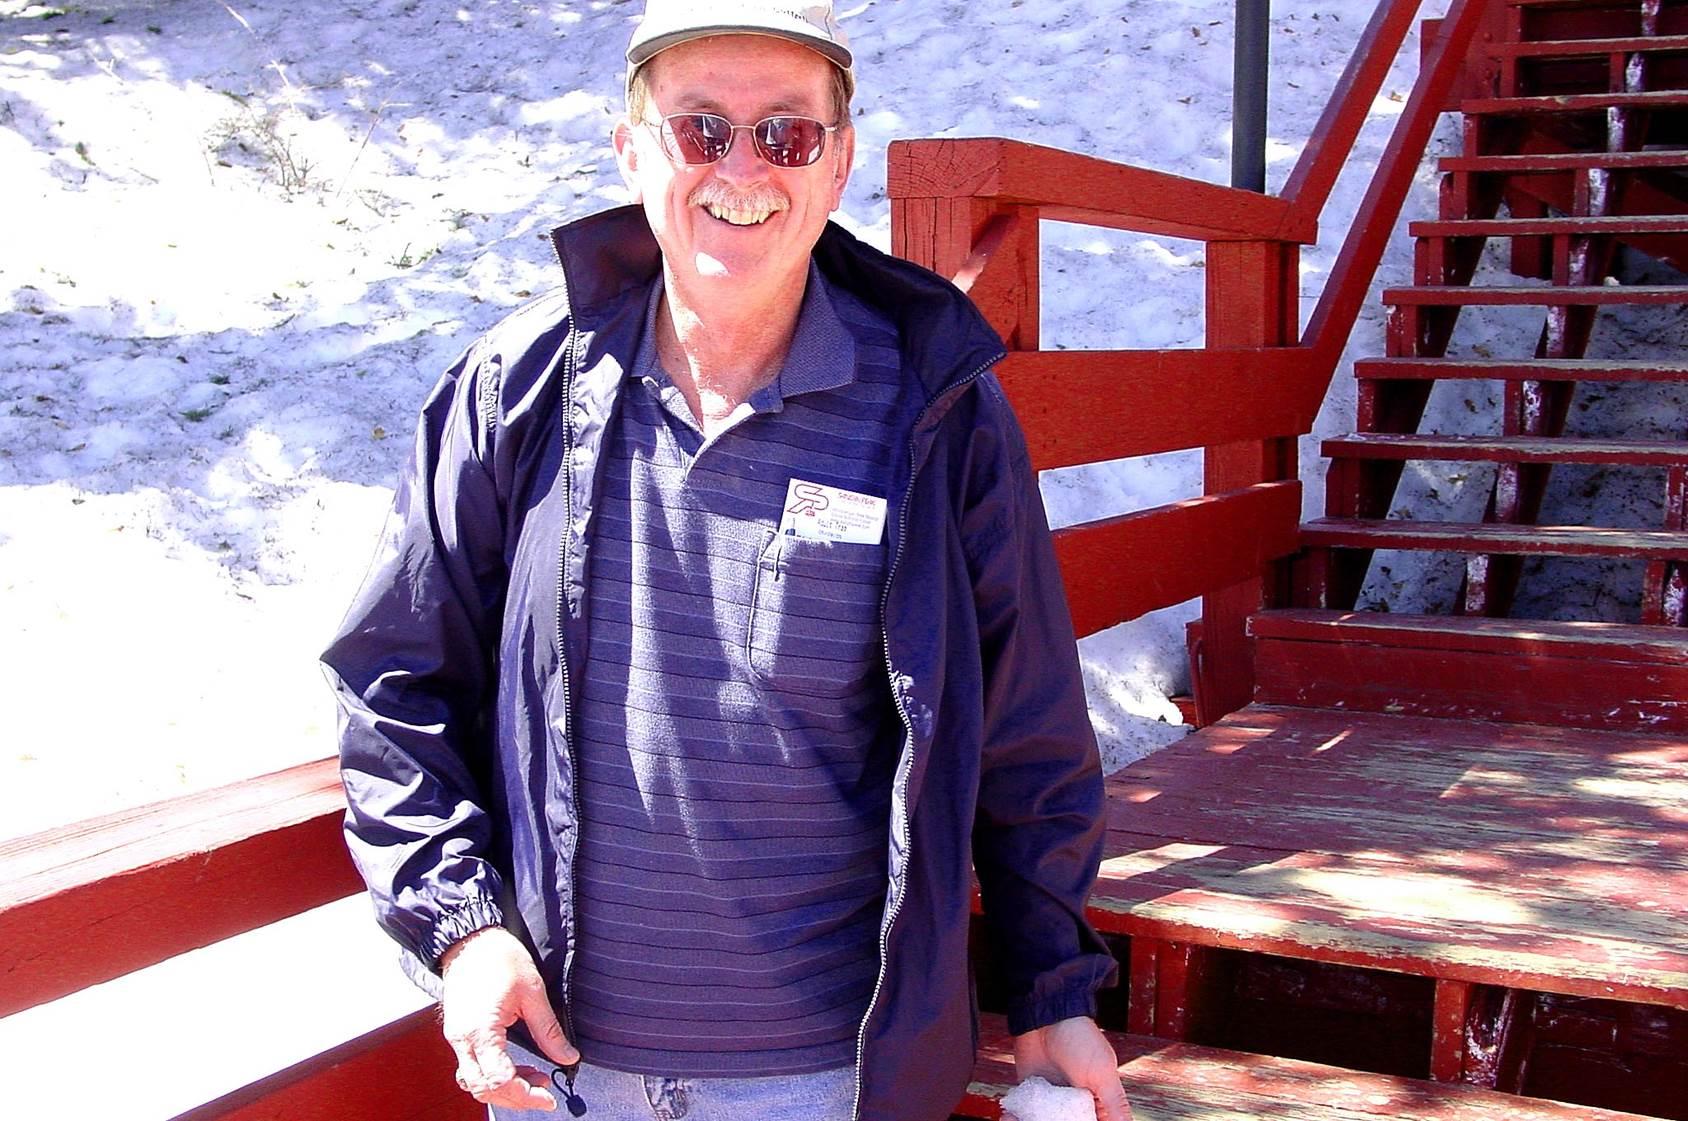 2005 Albuquerque NM family vacation